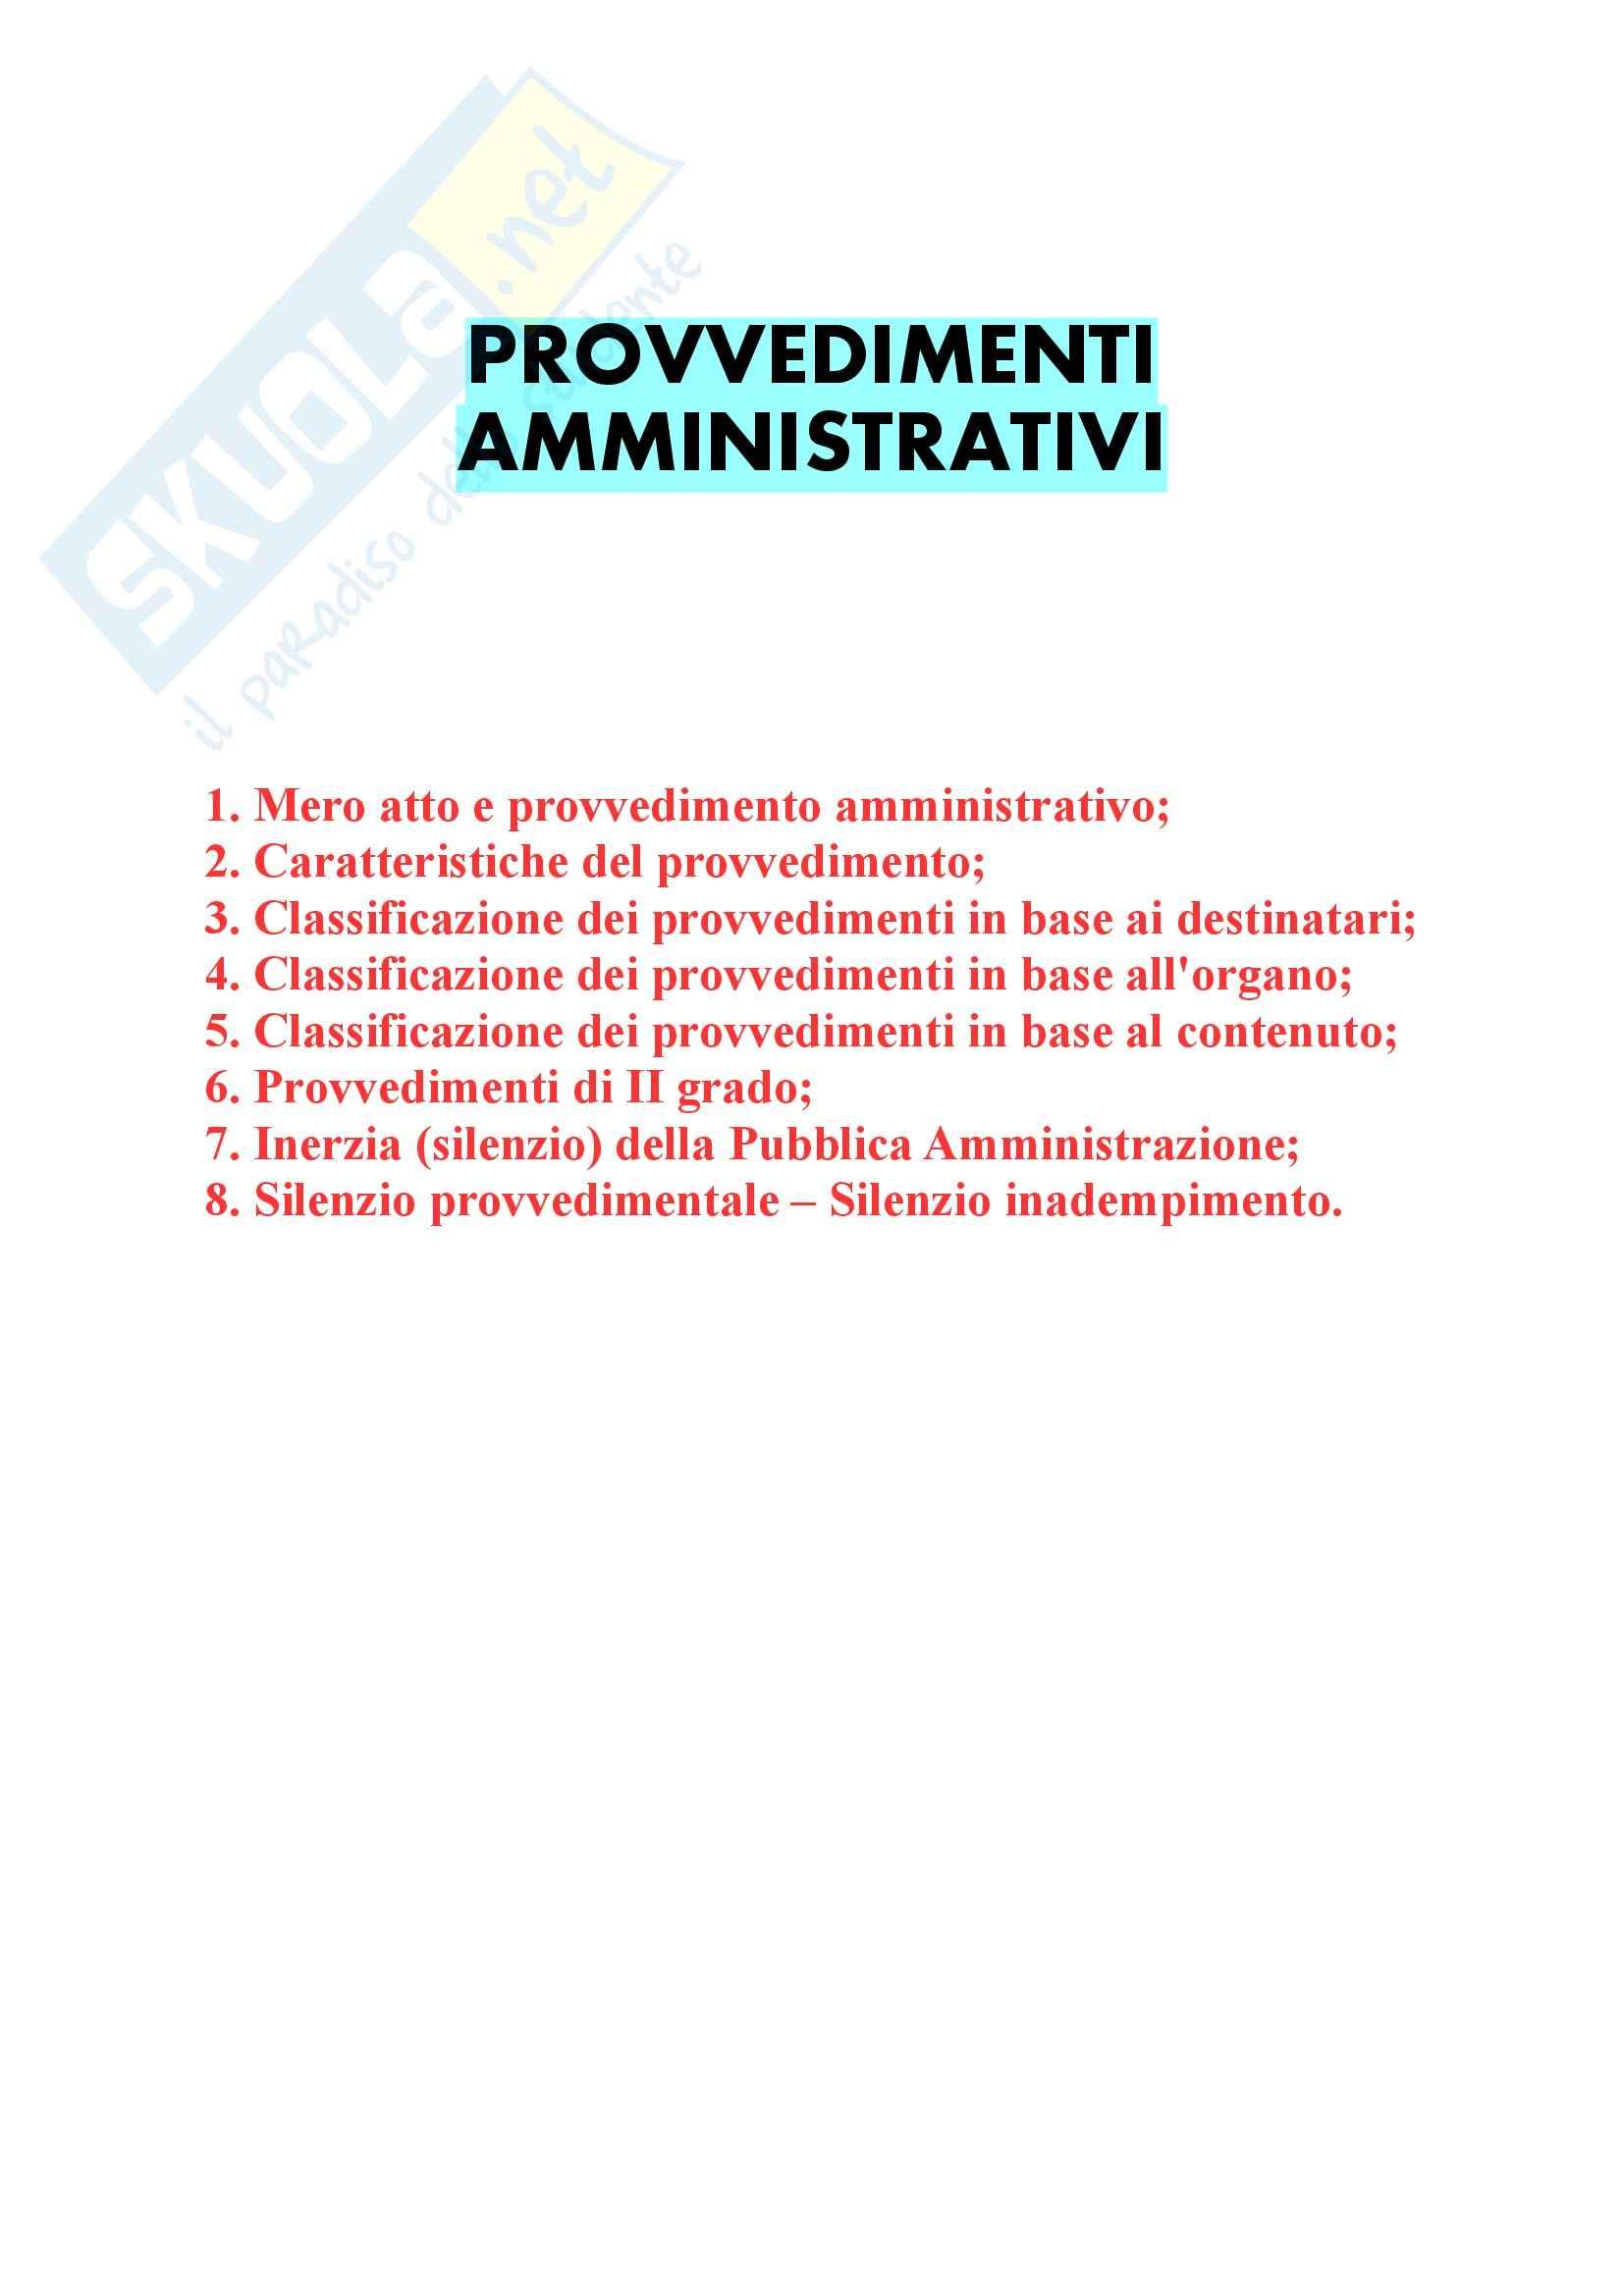 Riassunto esame Diritto amministrativo, prof. D'Emma